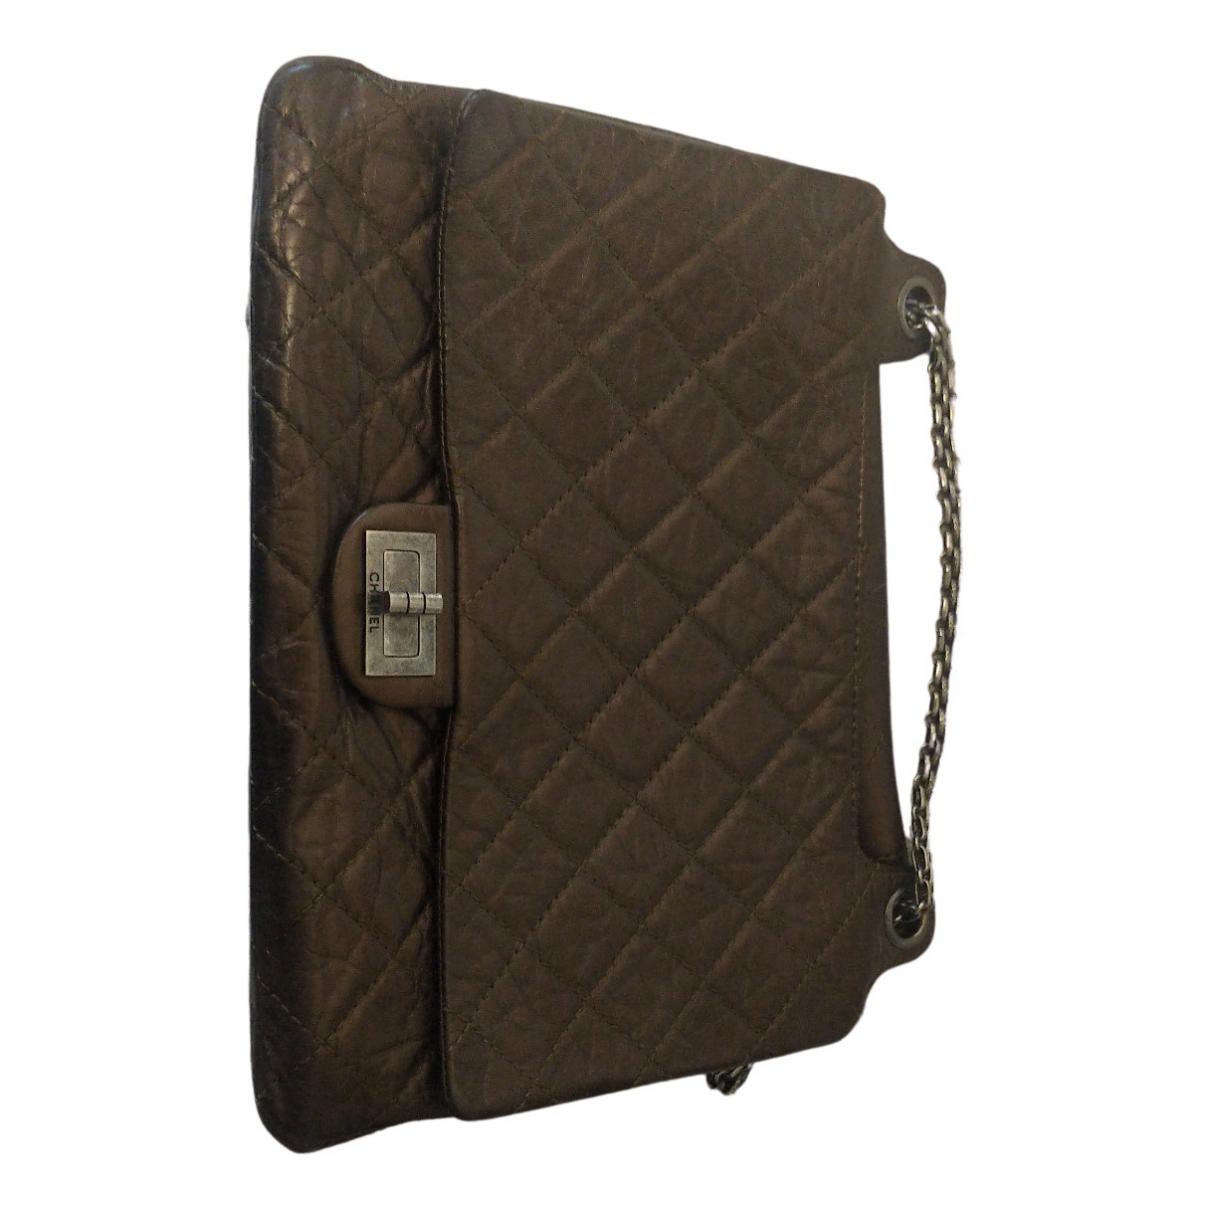 Chanel 2.55 Brown Leather handbag for Women N